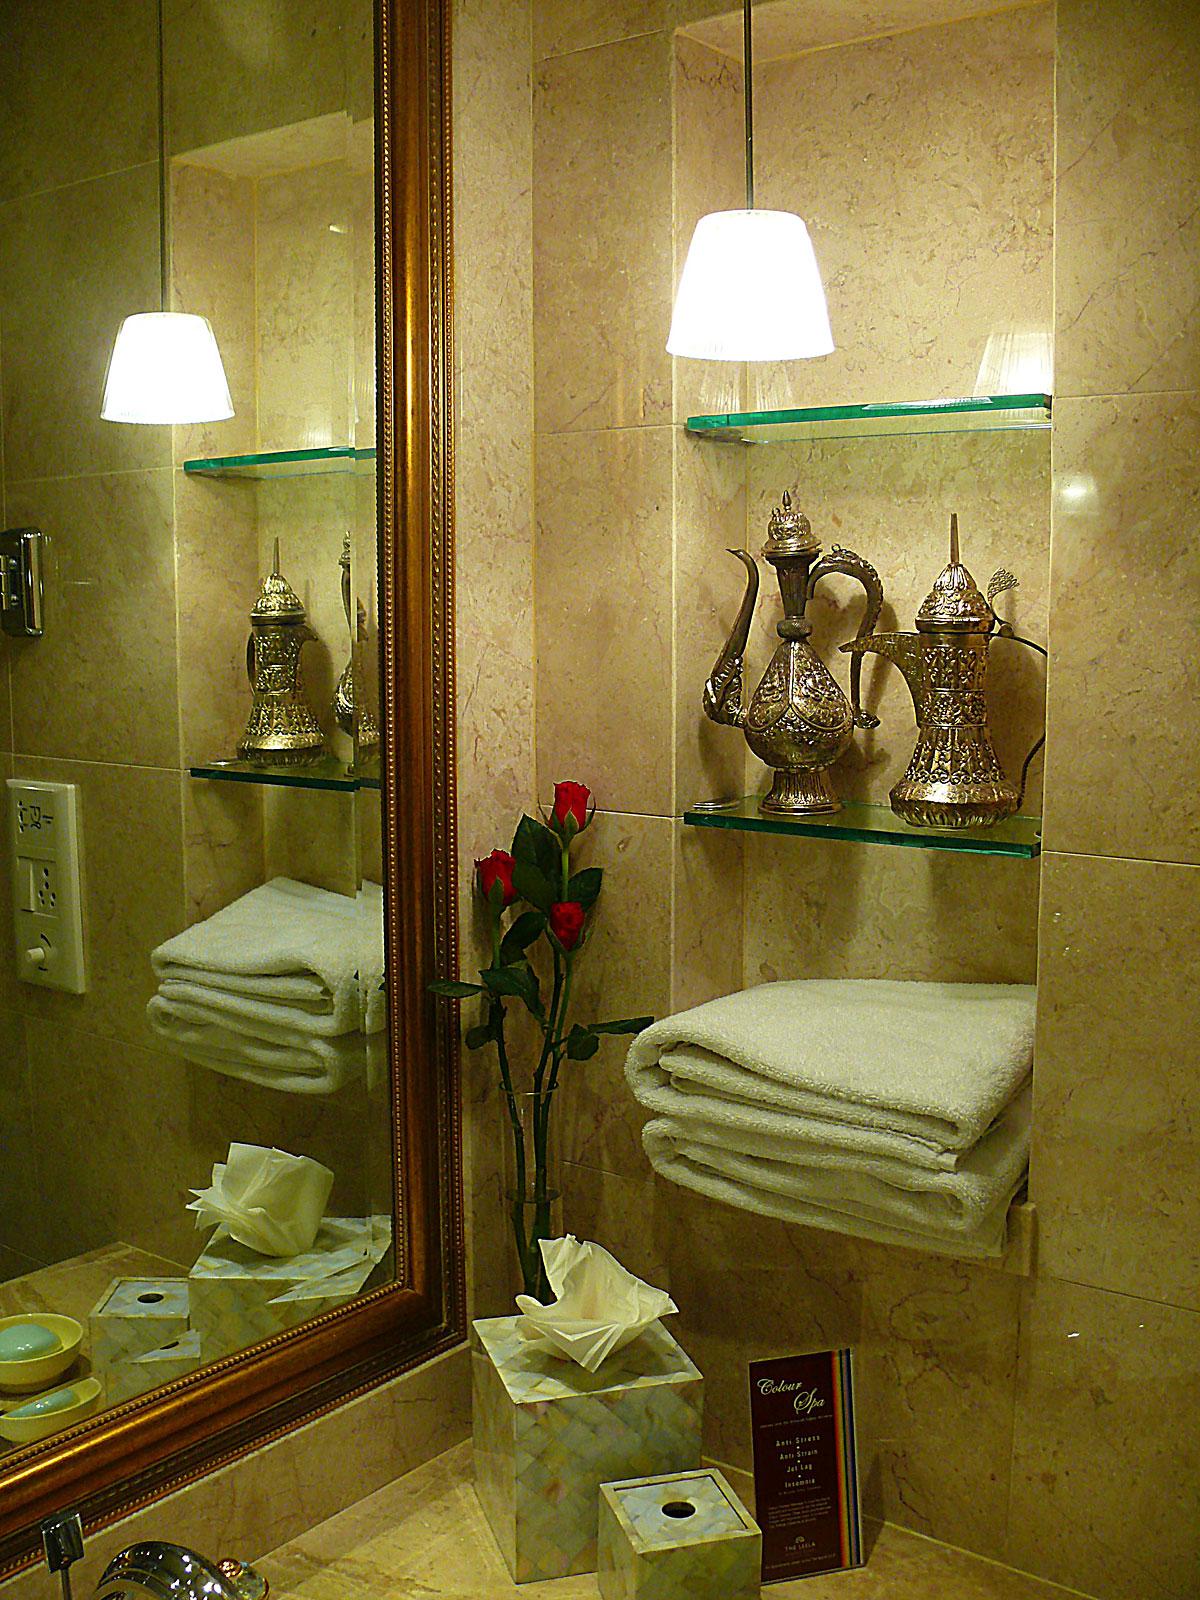 INDIEN MUMBAI Hotel The Leela FINEST-onTour P1030646.jpg